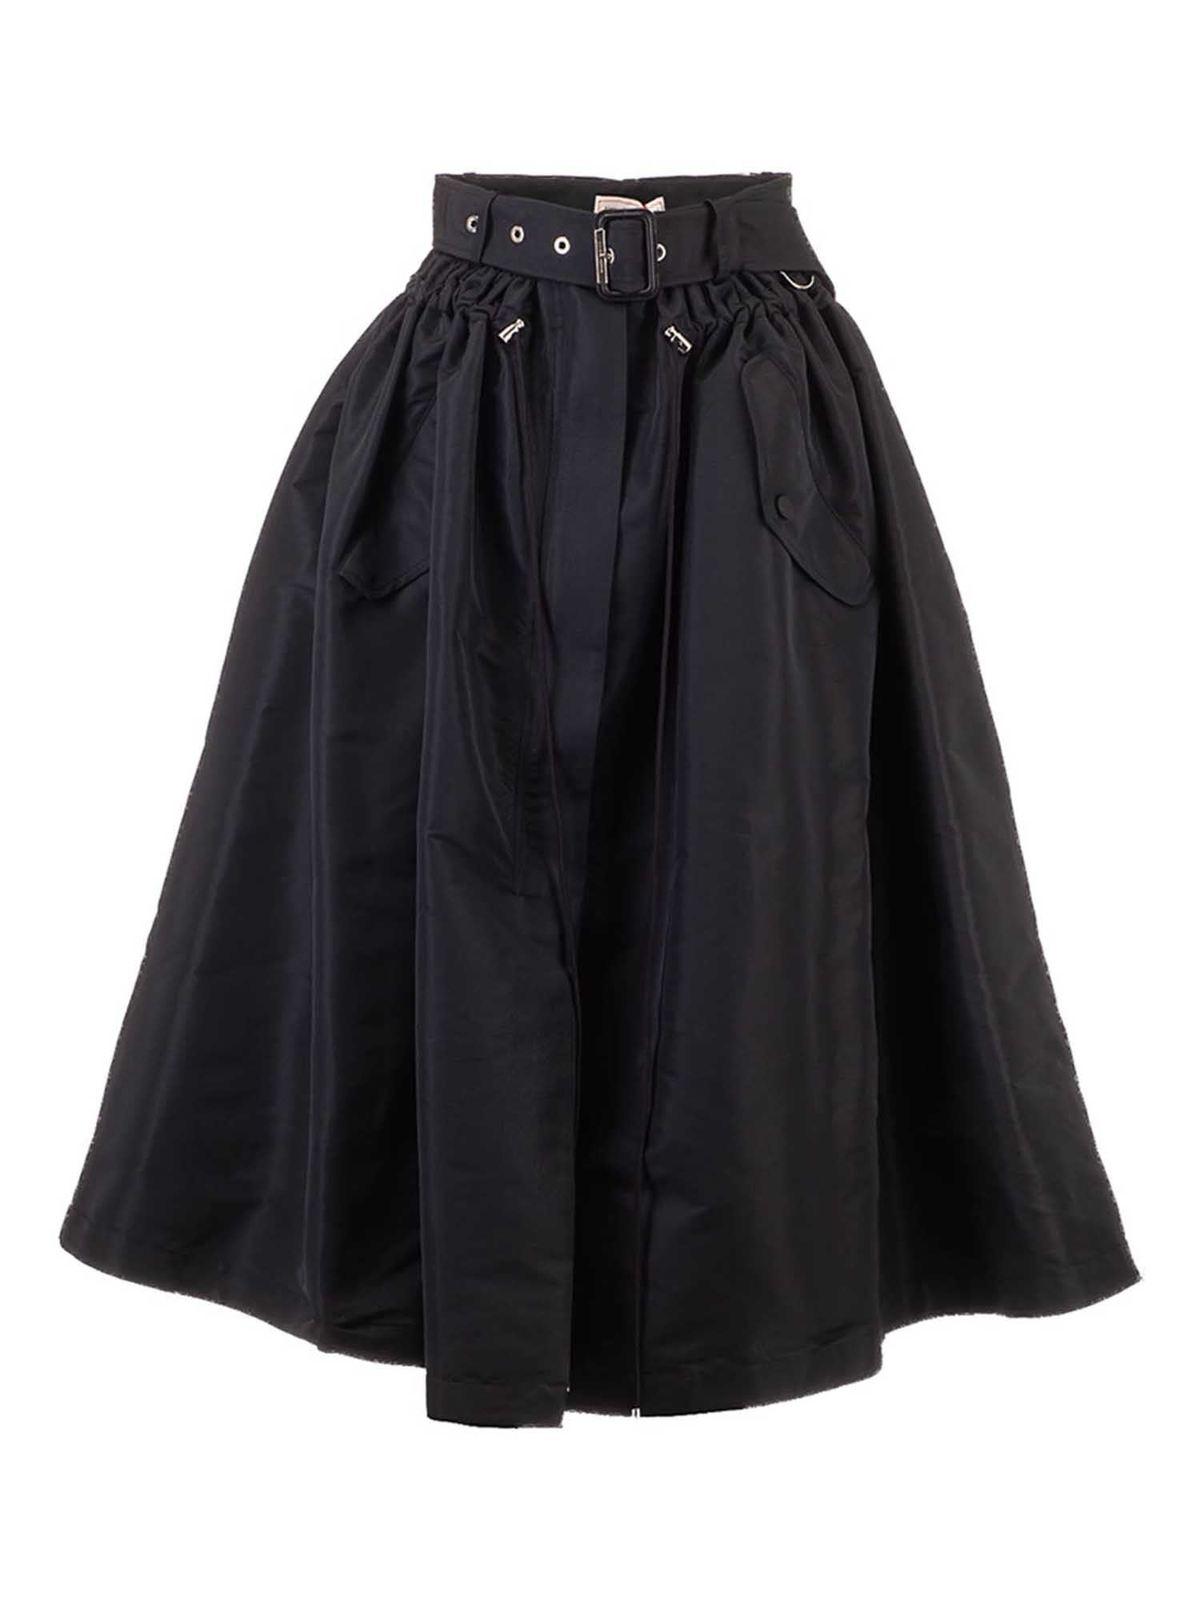 Alexander Mcqueen Skirts PARKA SKIRT IN BLACK